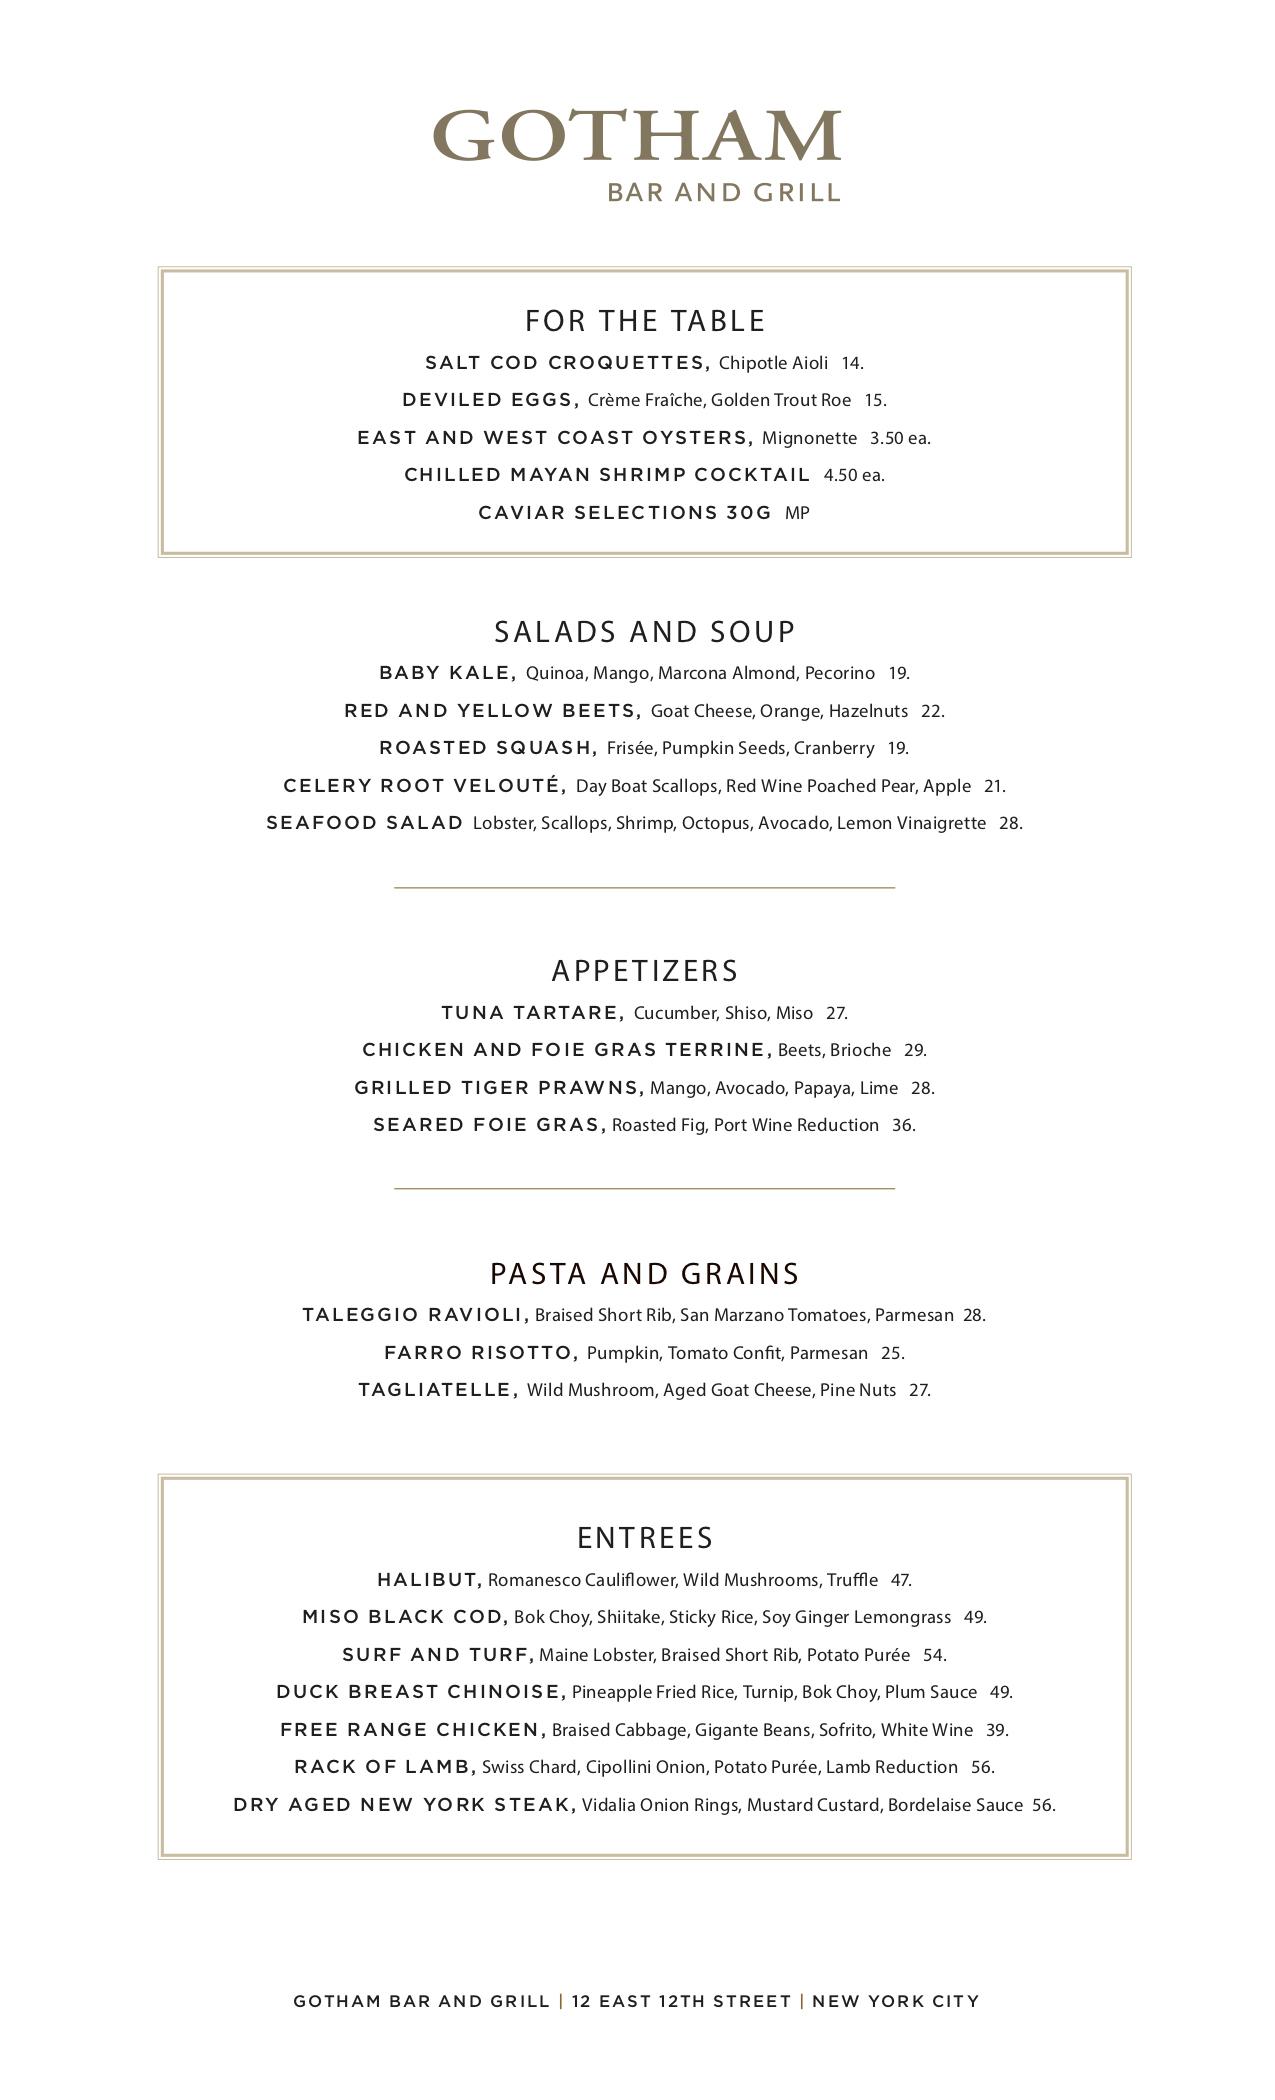 Gotham-Menu-Dinner-R9.1_10-15-18-with-logo.jpg